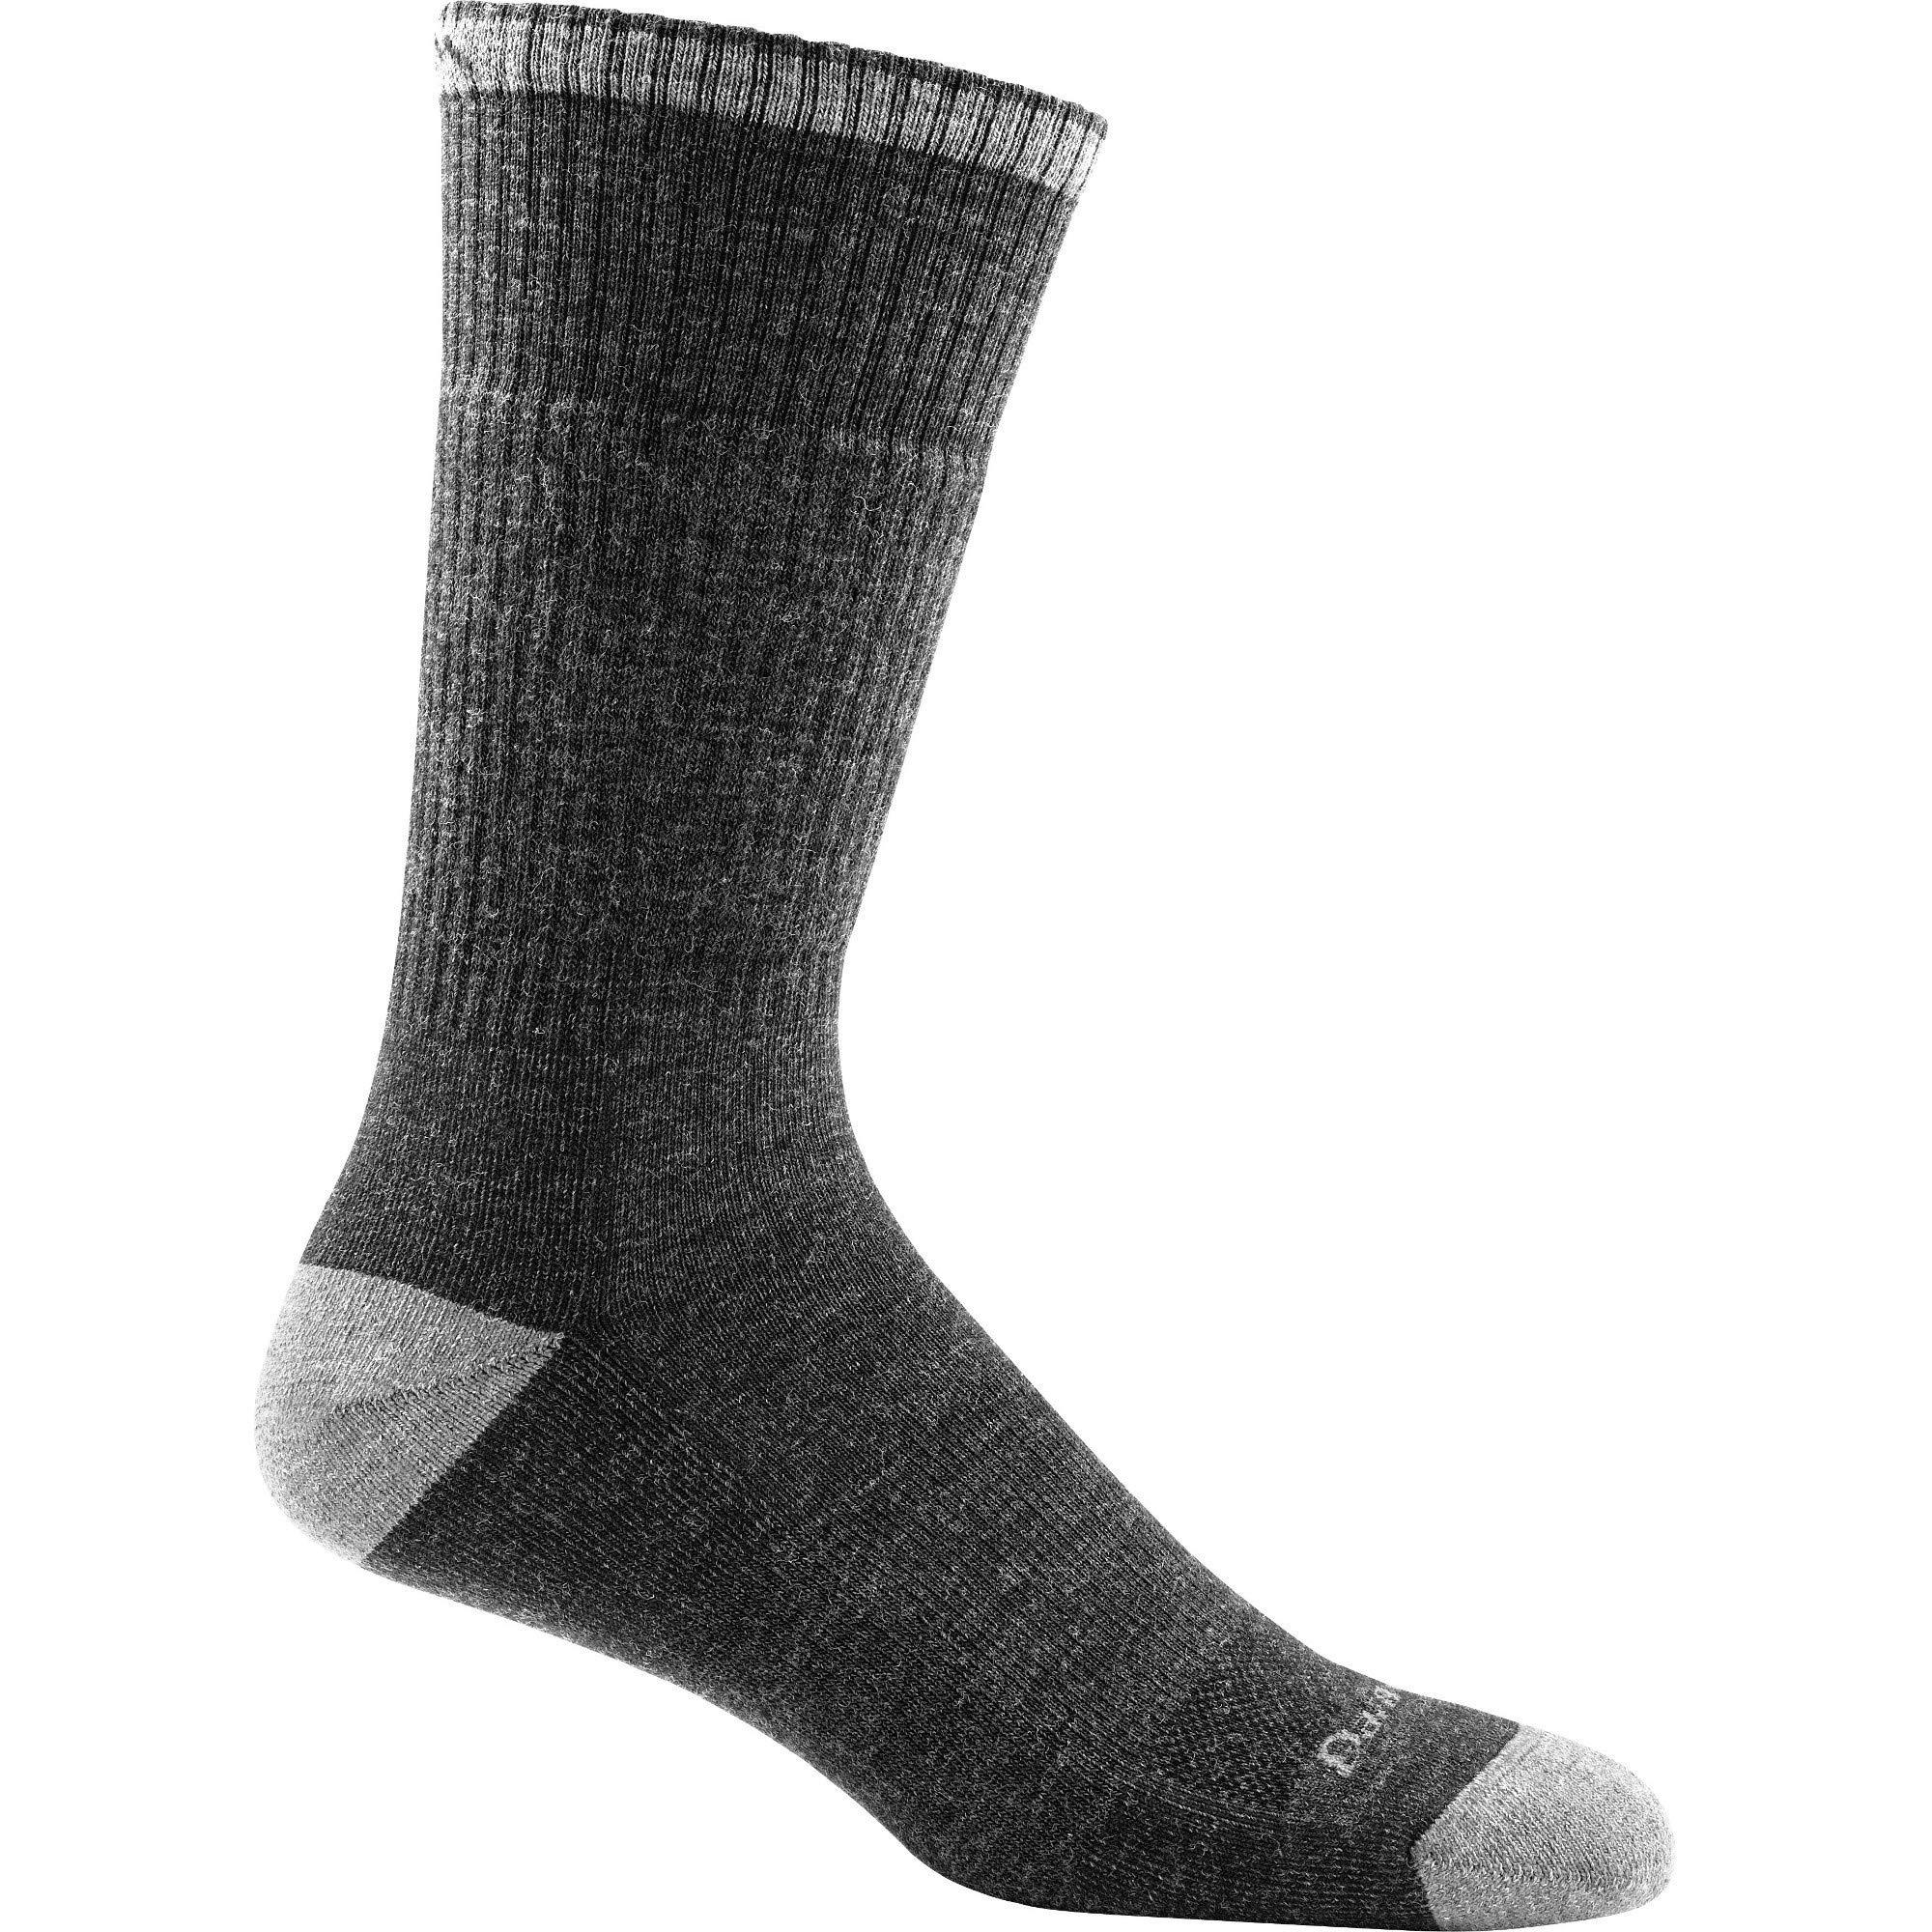 Darn Tough John Henry Boot Cushion Socks - Men's Gravel 2X-Large by Darn Tough